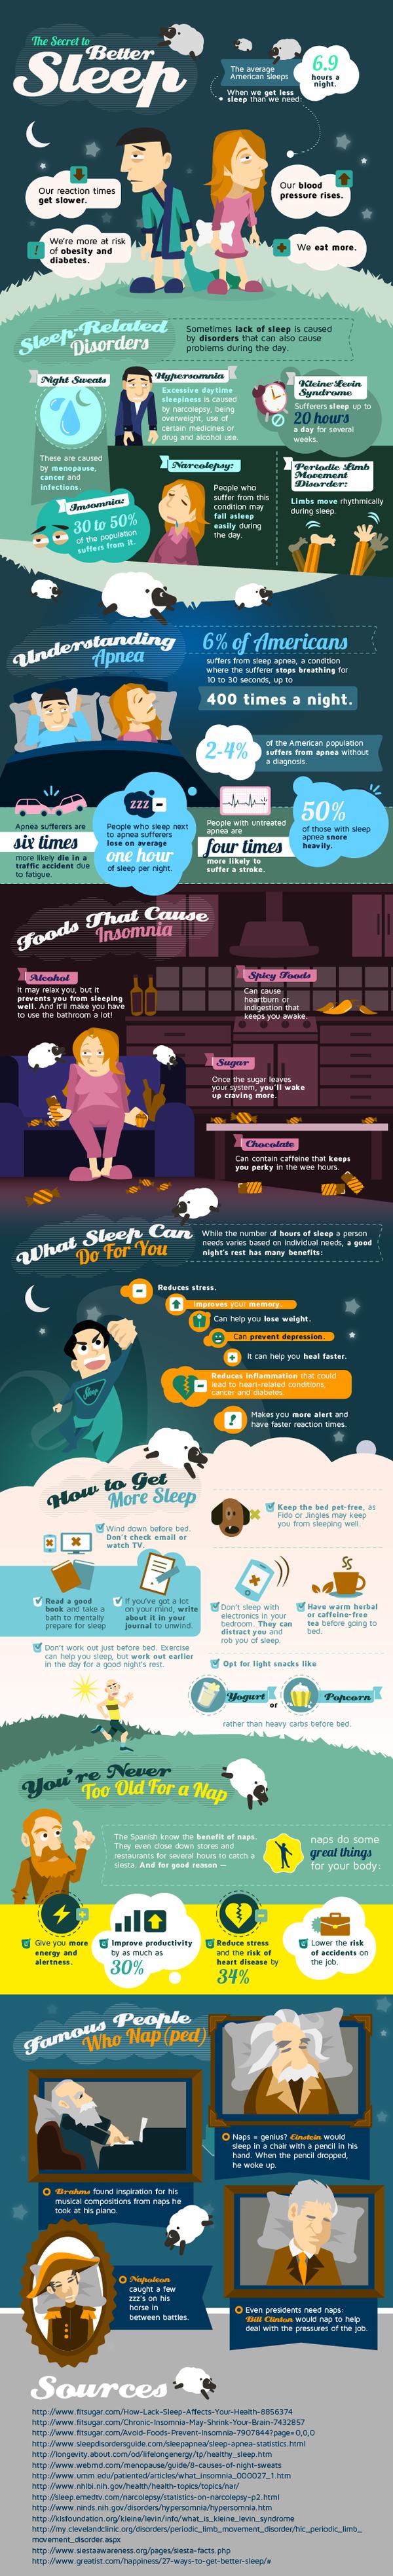 The-secret-to-better-sleep